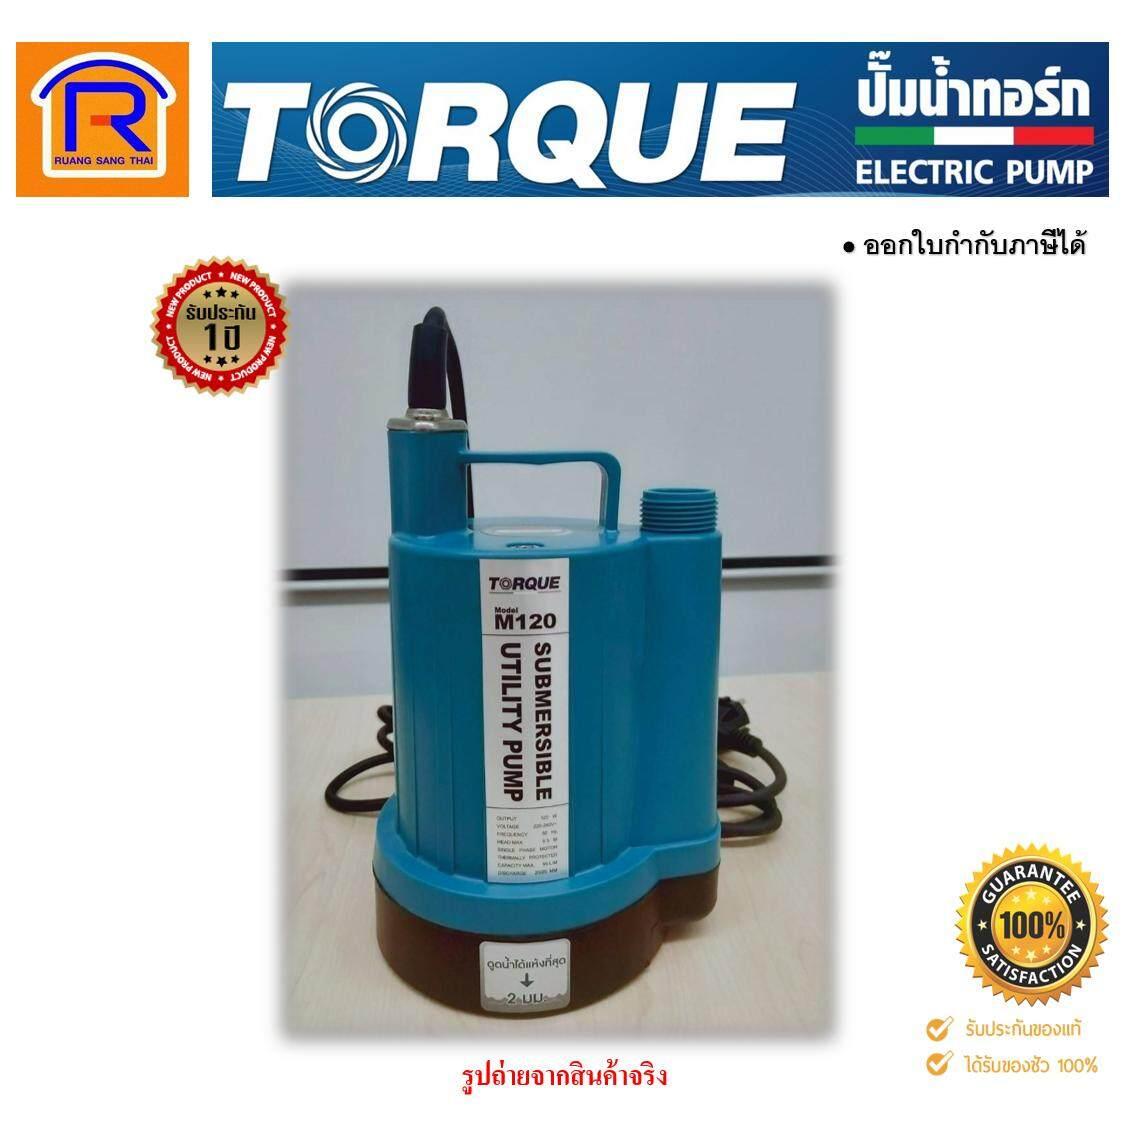 TORQUE (ทอร์ก) ปั๊มไดโว่ รุ่น TQ-M120  ส่งน้ำสูง torque tq-m120 ปั๊มน้ำ ปั๊มแช่ ปั๊มจุ่ม ไดโว่ ปั๊มน้ำพุ น้ำตก ปั๊มน้ำแบบจุ่ม ปั๊มน้ำแบบแช่ (Booster pump) (36626937)